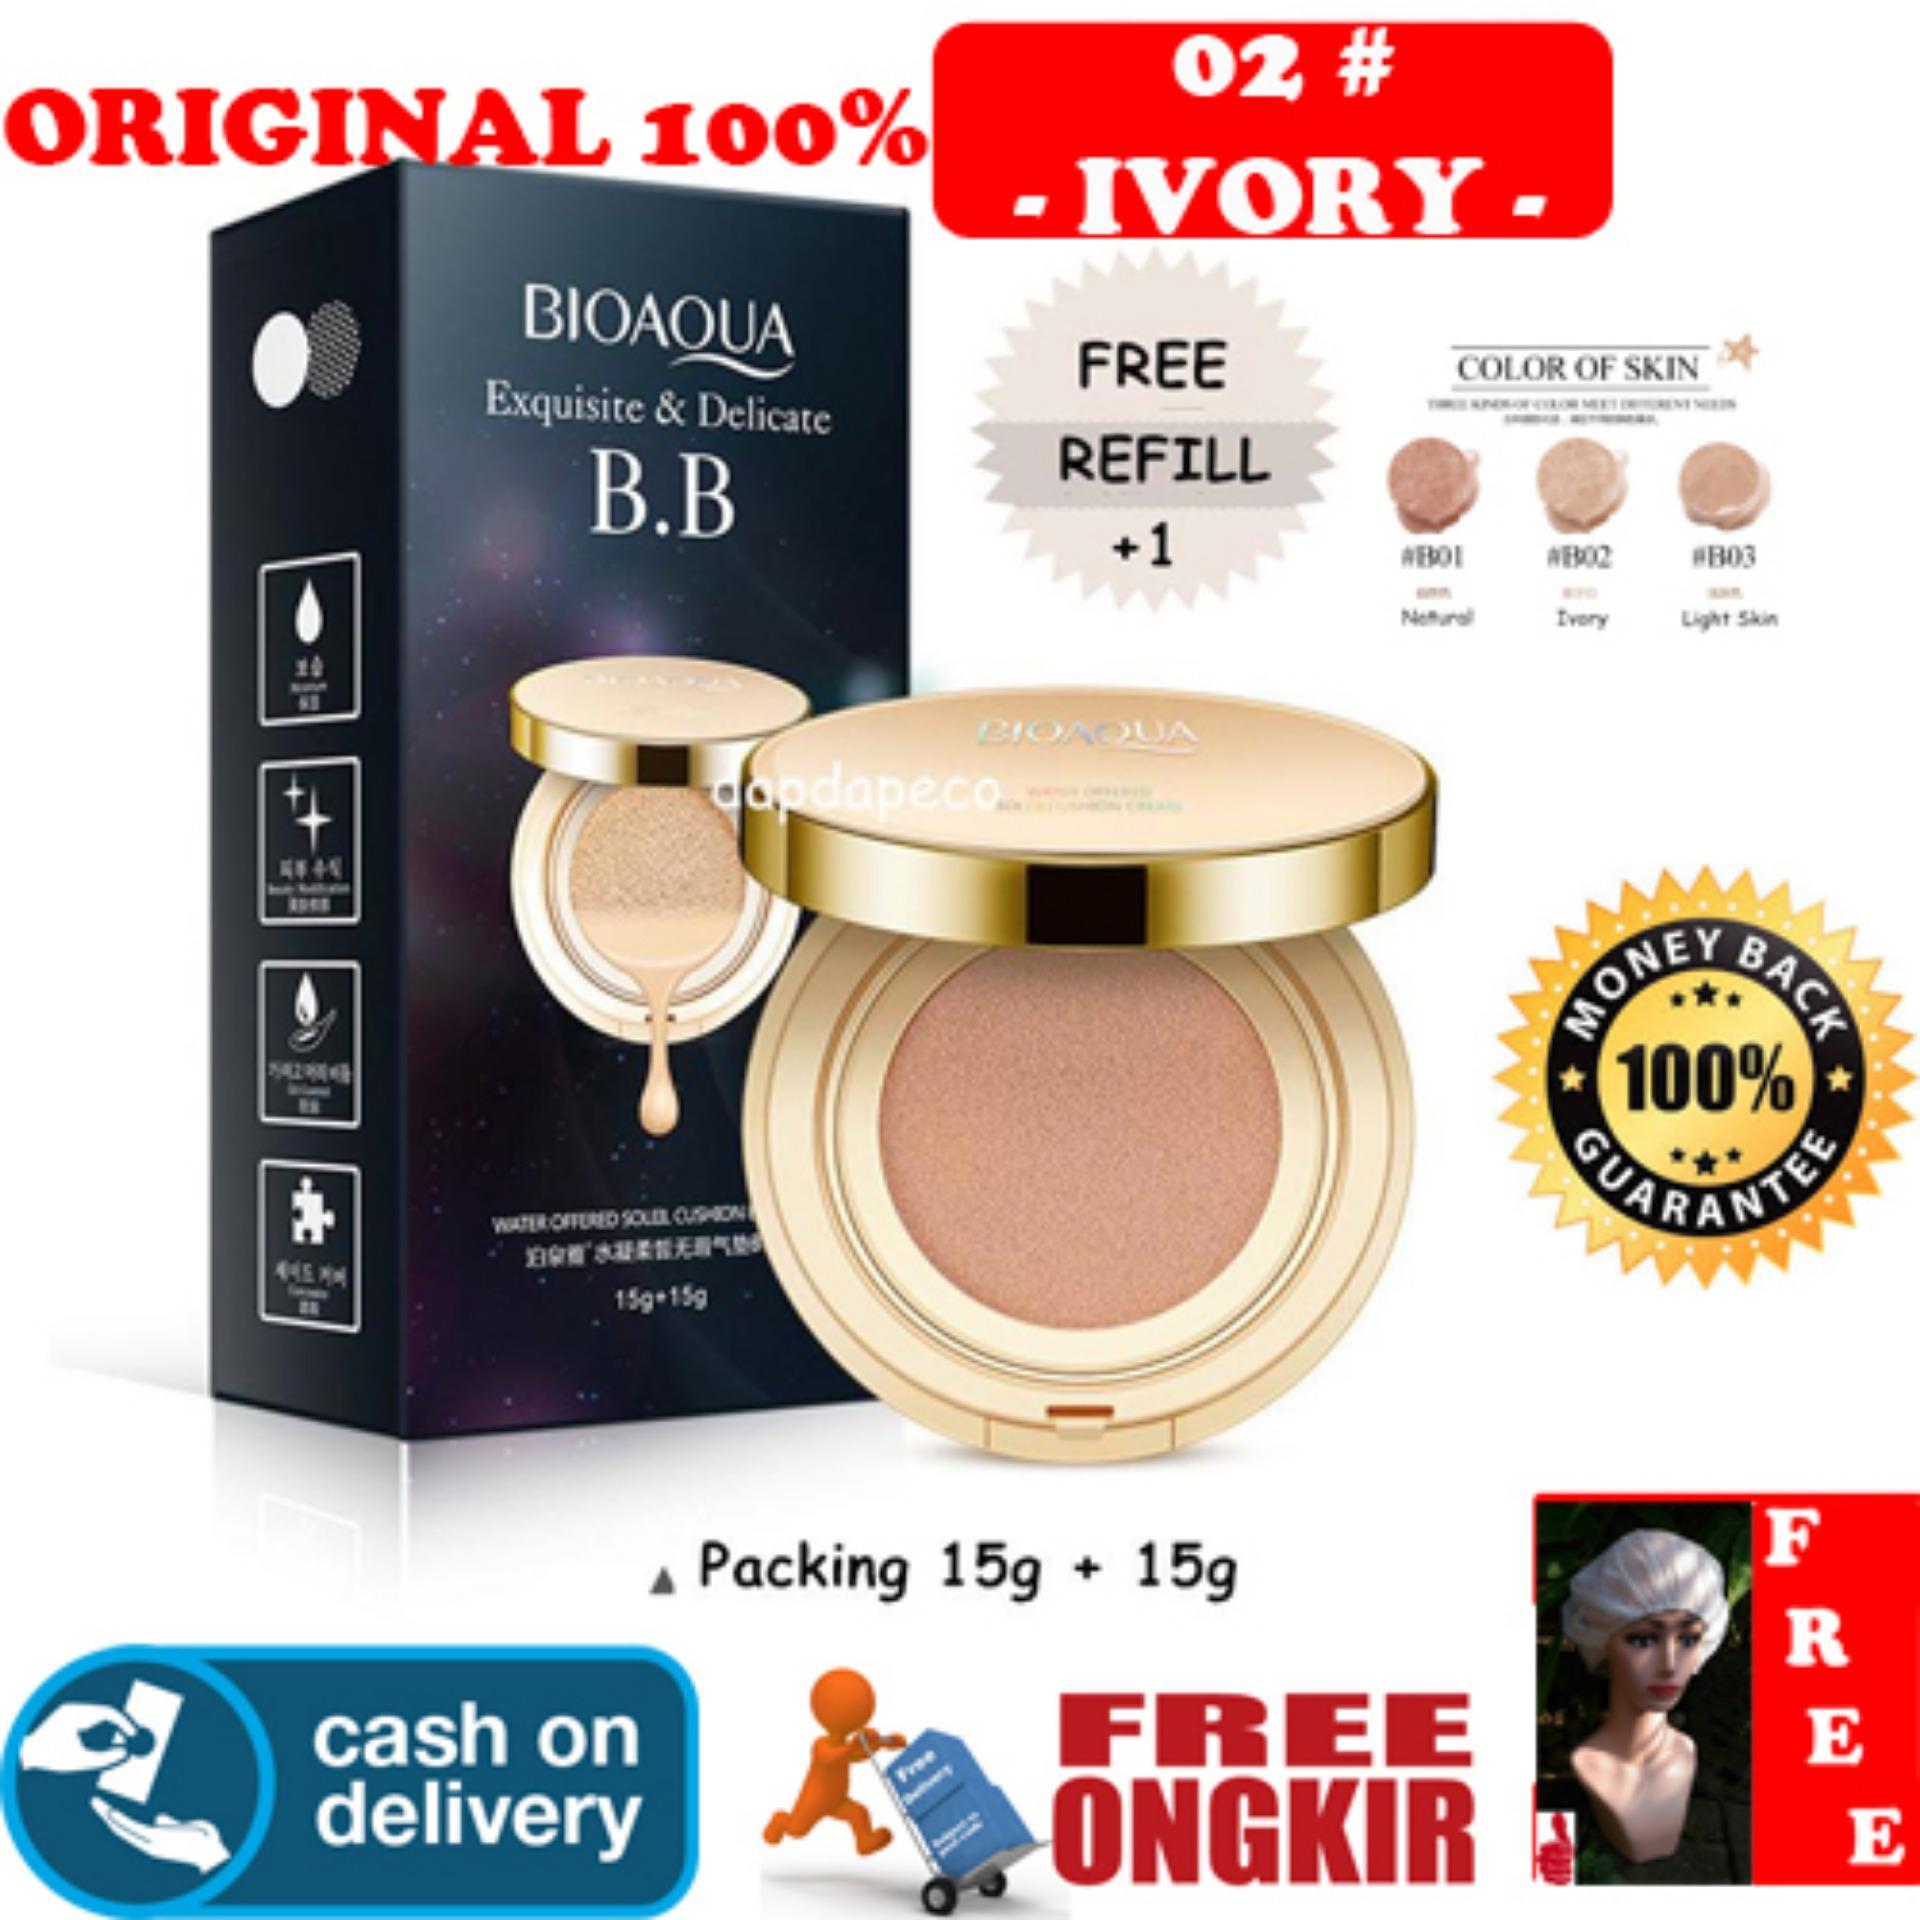 Cek Harga Baru Bioaqua Exquisite And Delicate Bb Cream Air Cushion Bio Aqua Aircusion Hoki Cod 02 Ivory